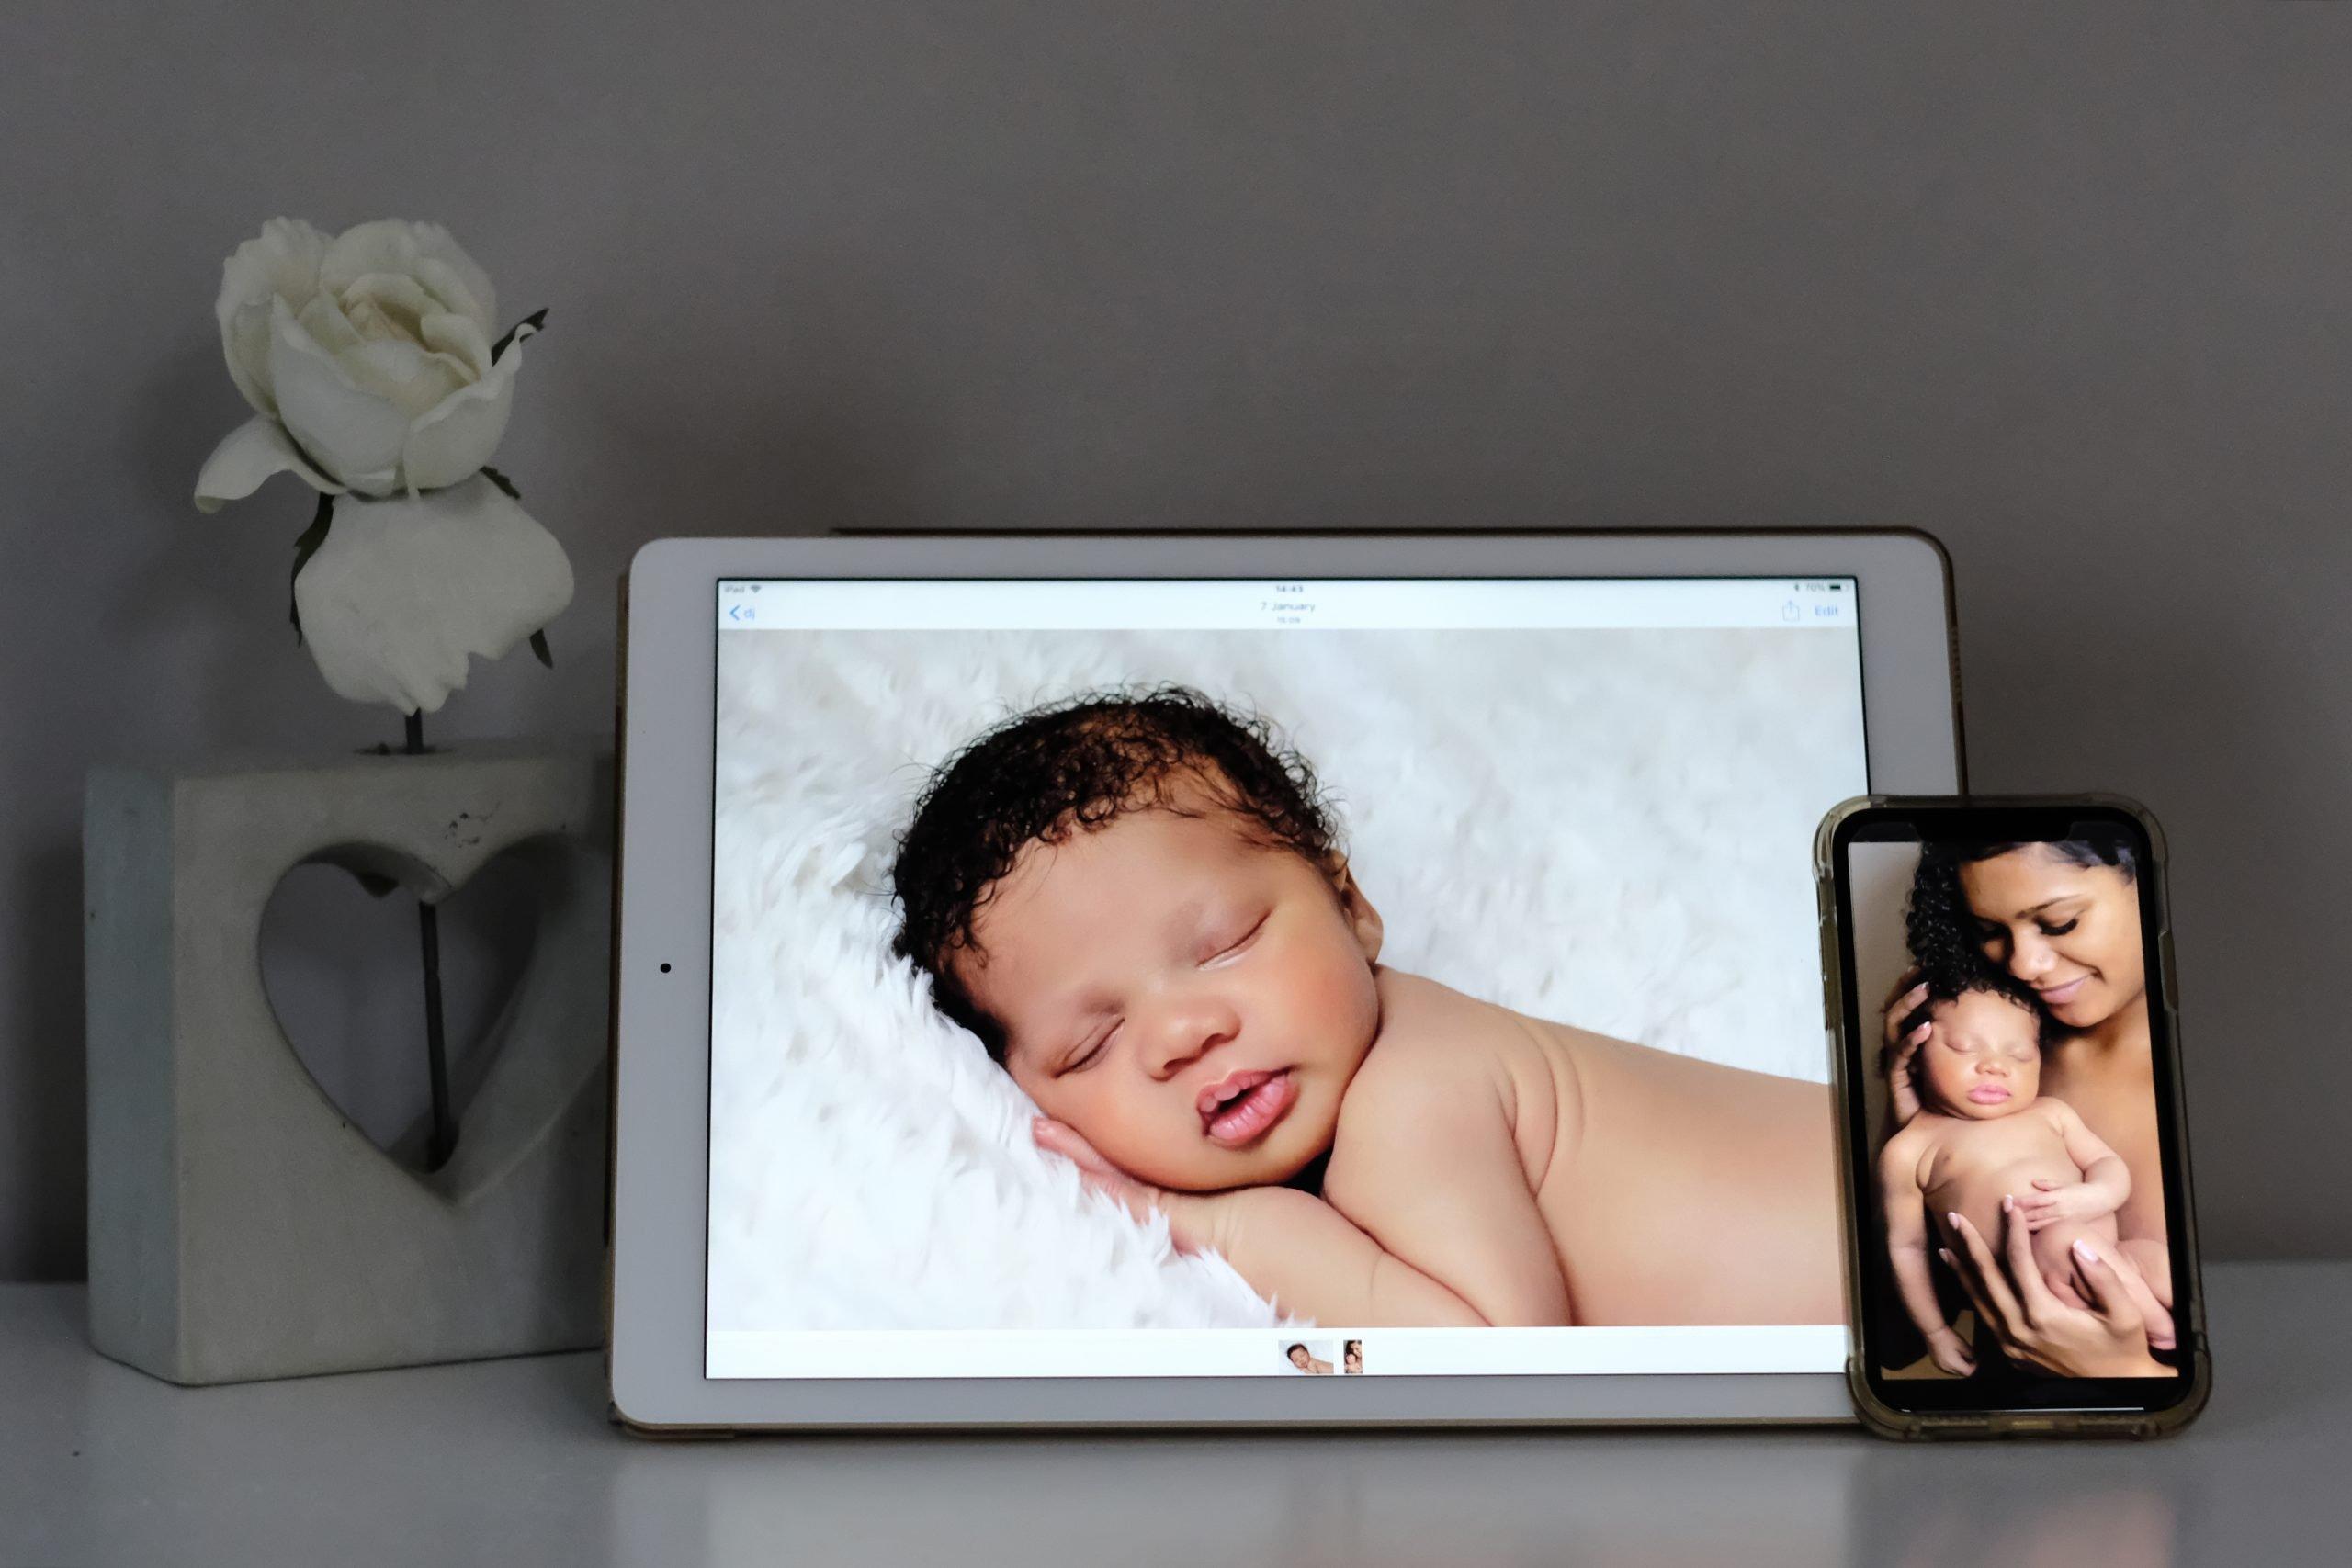 newborn digital images on iPad and phone